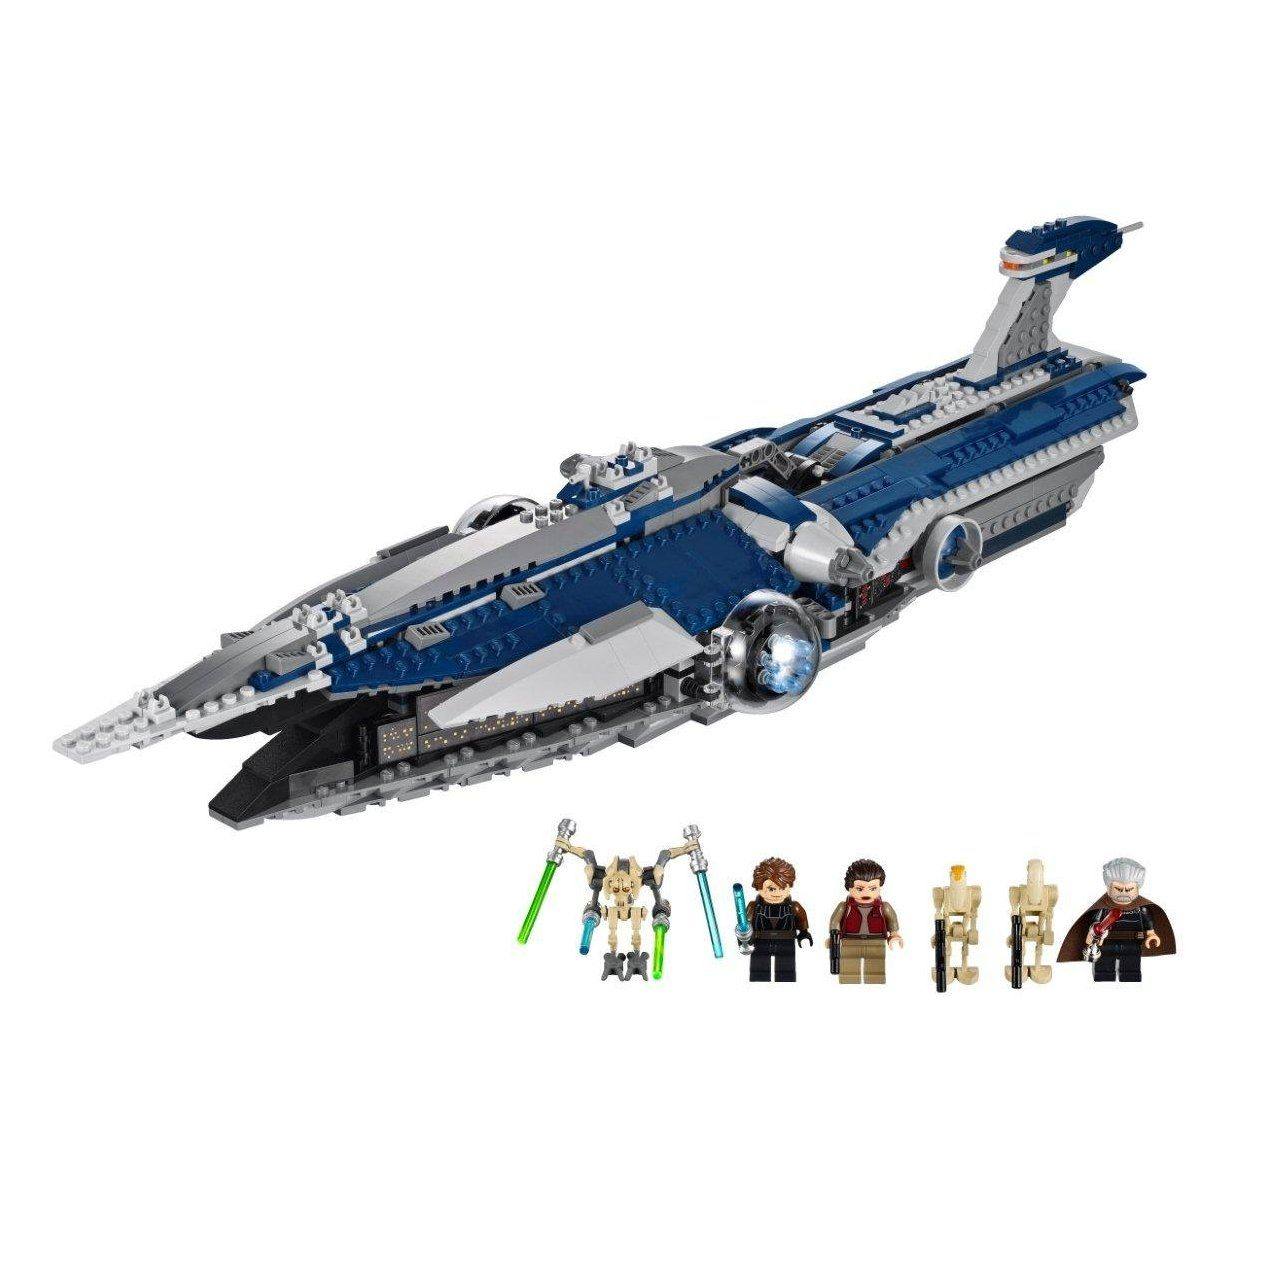 lego star wars sets home malevolence 9515 lego star wars malevolence set picture - Lego Star Wars Vaisseau Clone